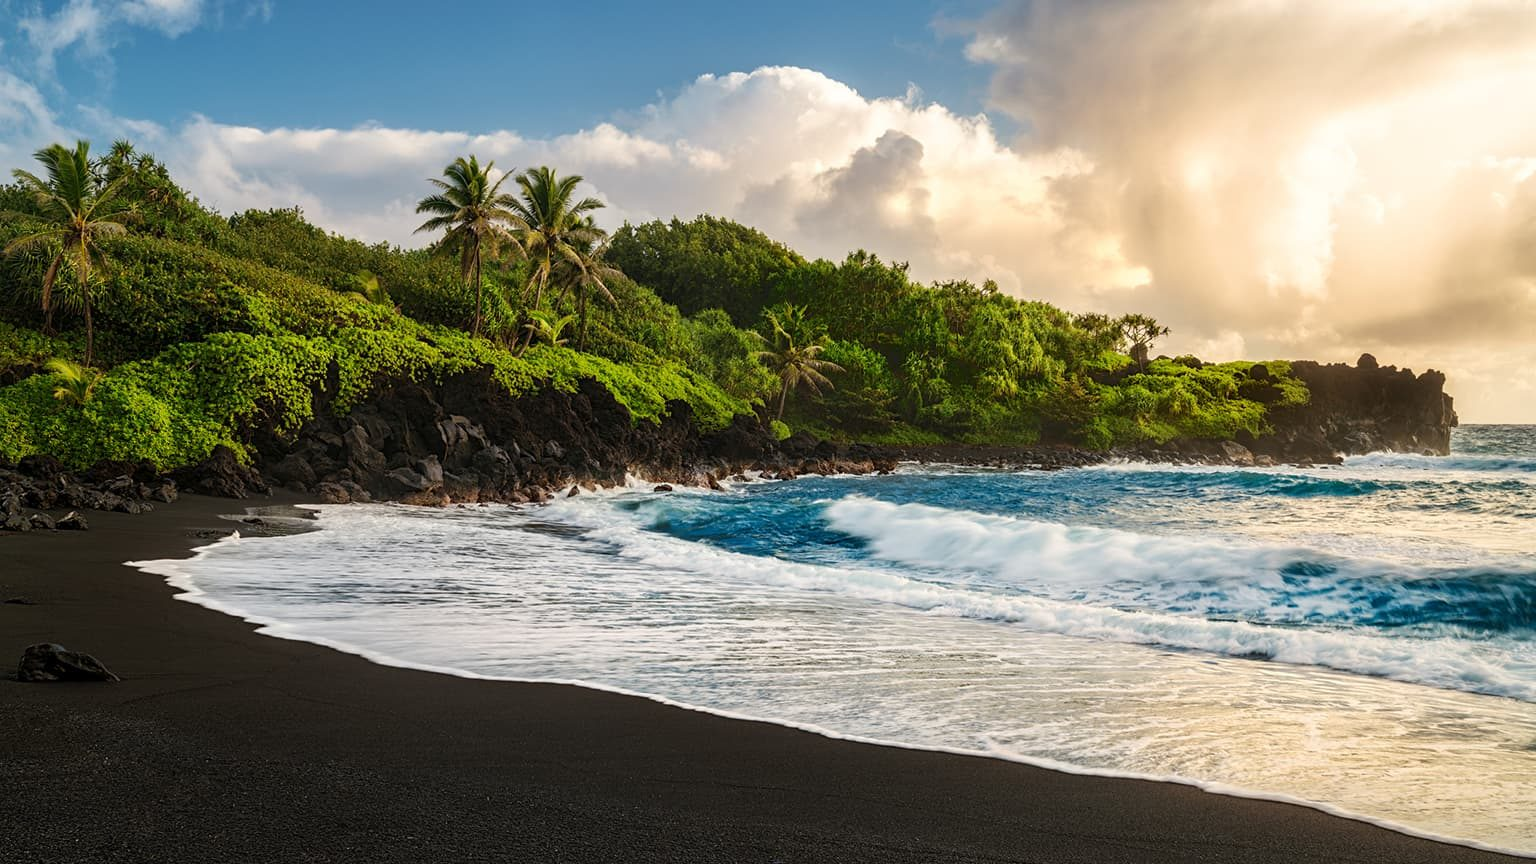 Waianapanapa Beach showing volcanic black sand with waves and sun shining